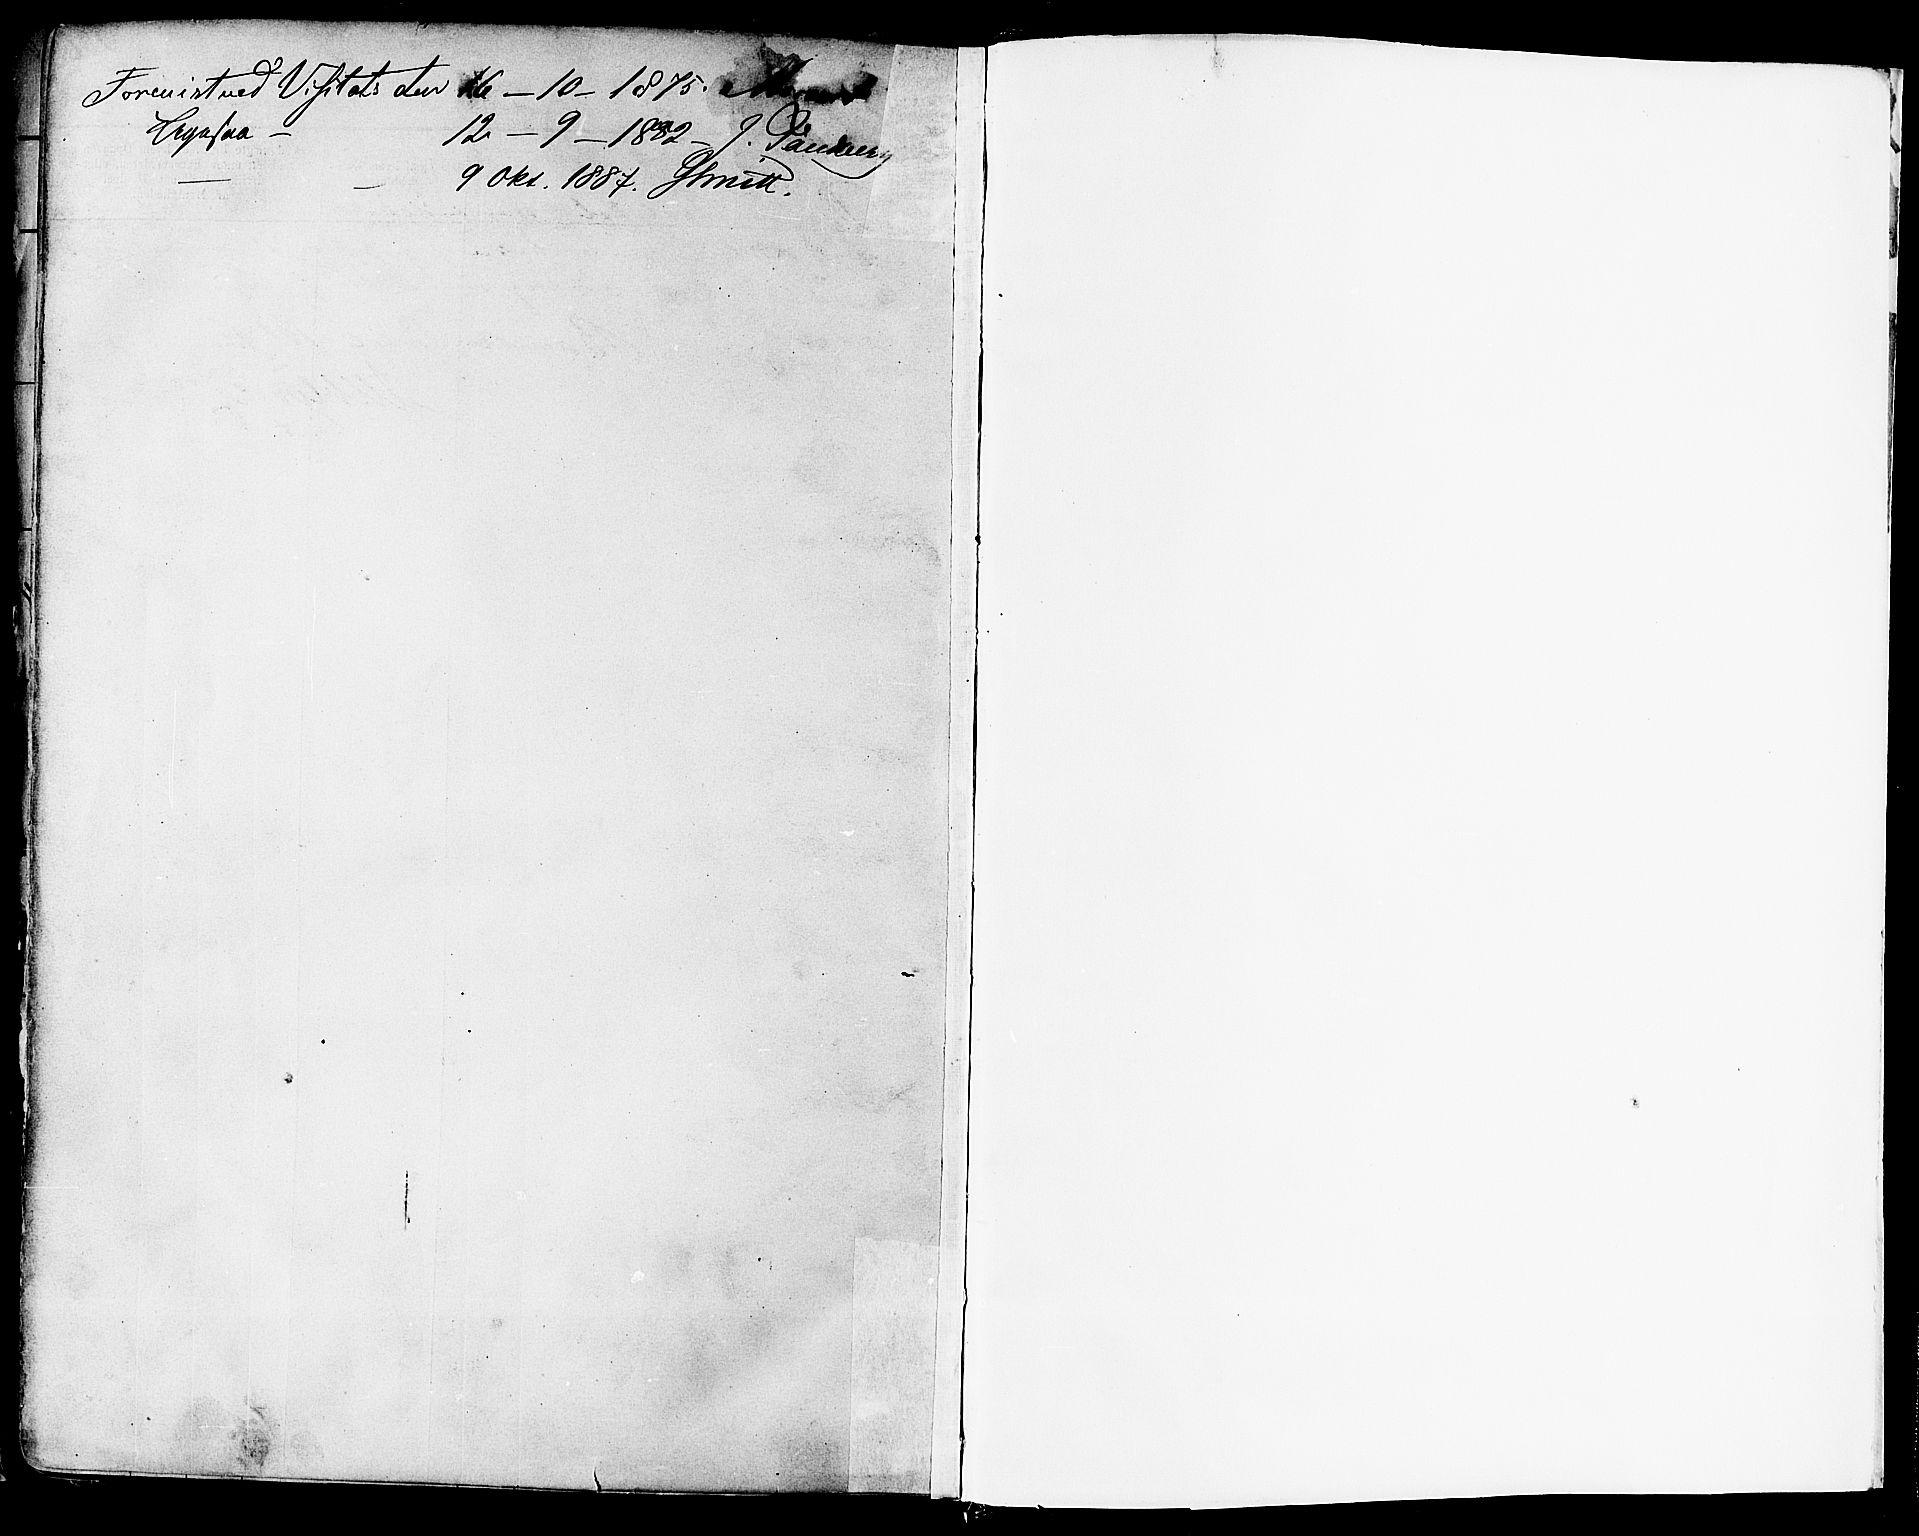 SAKO, Kragerø kirkebøker, F/Fa/L0011: Ministerialbok nr. 11, 1875-1886